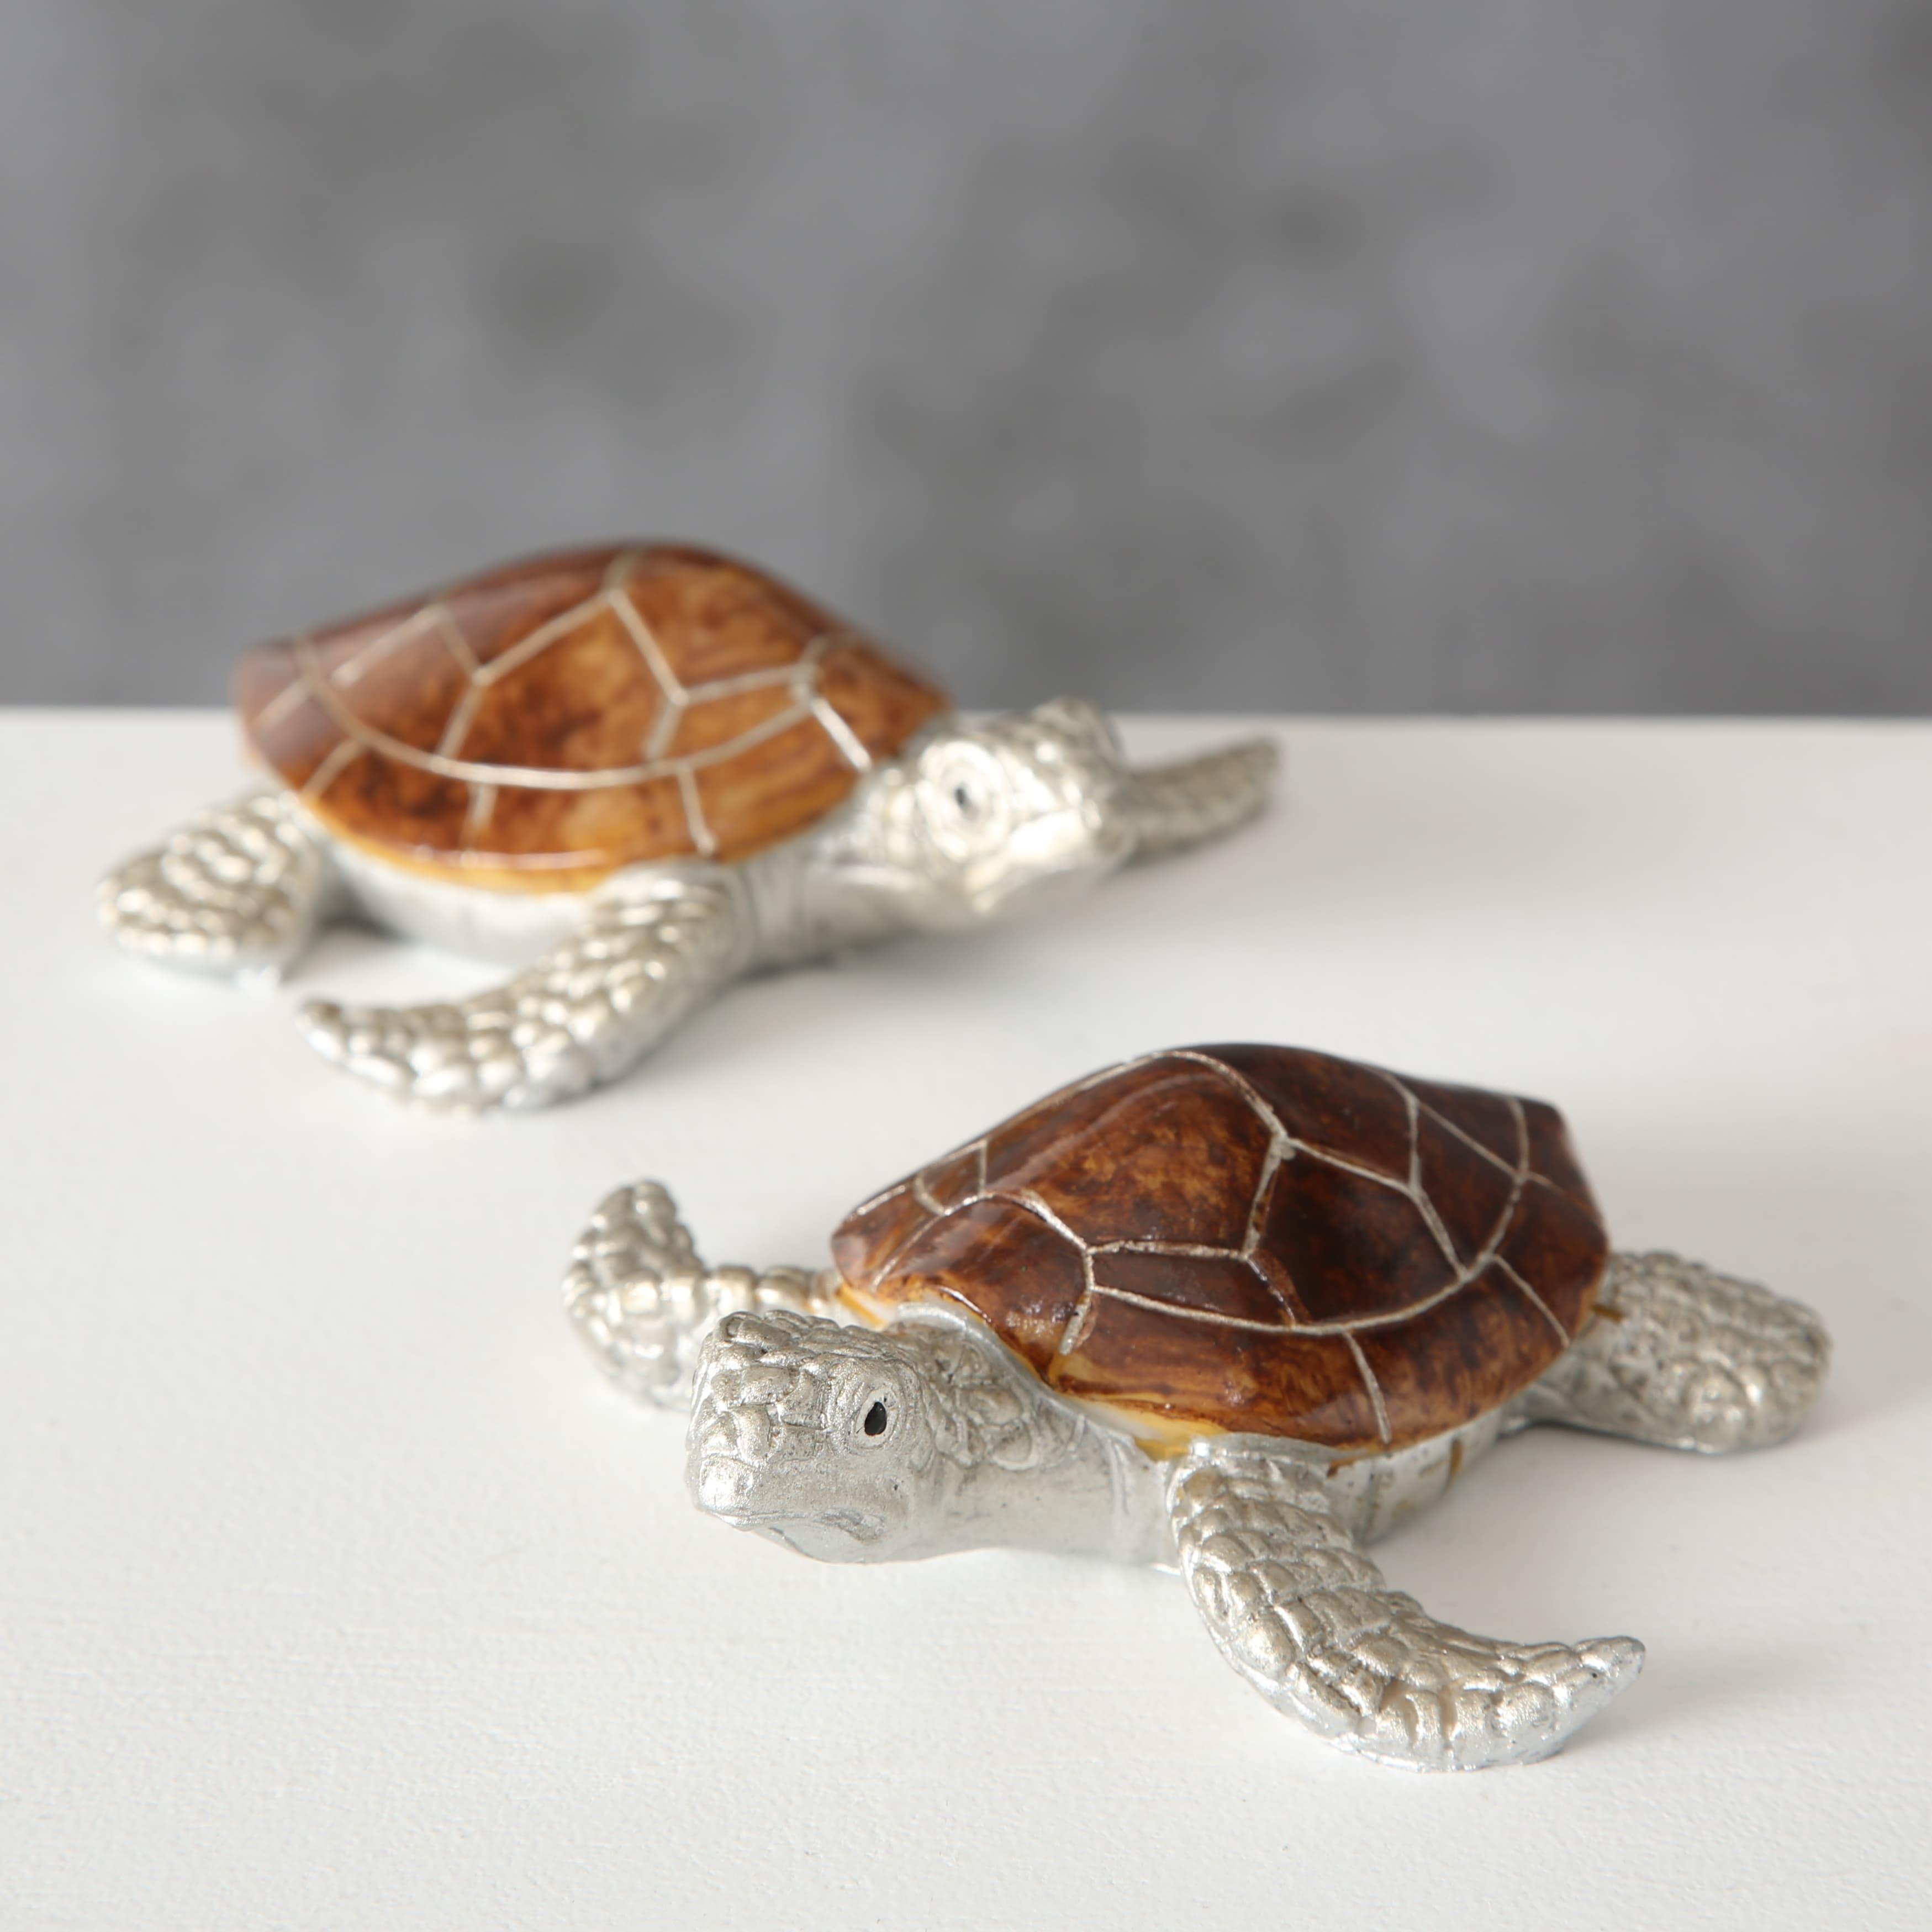 Decoratiune din polirasina Bijan Turtle Argintiu / Maro, Modele Asortate, l11xA11xH4 cm